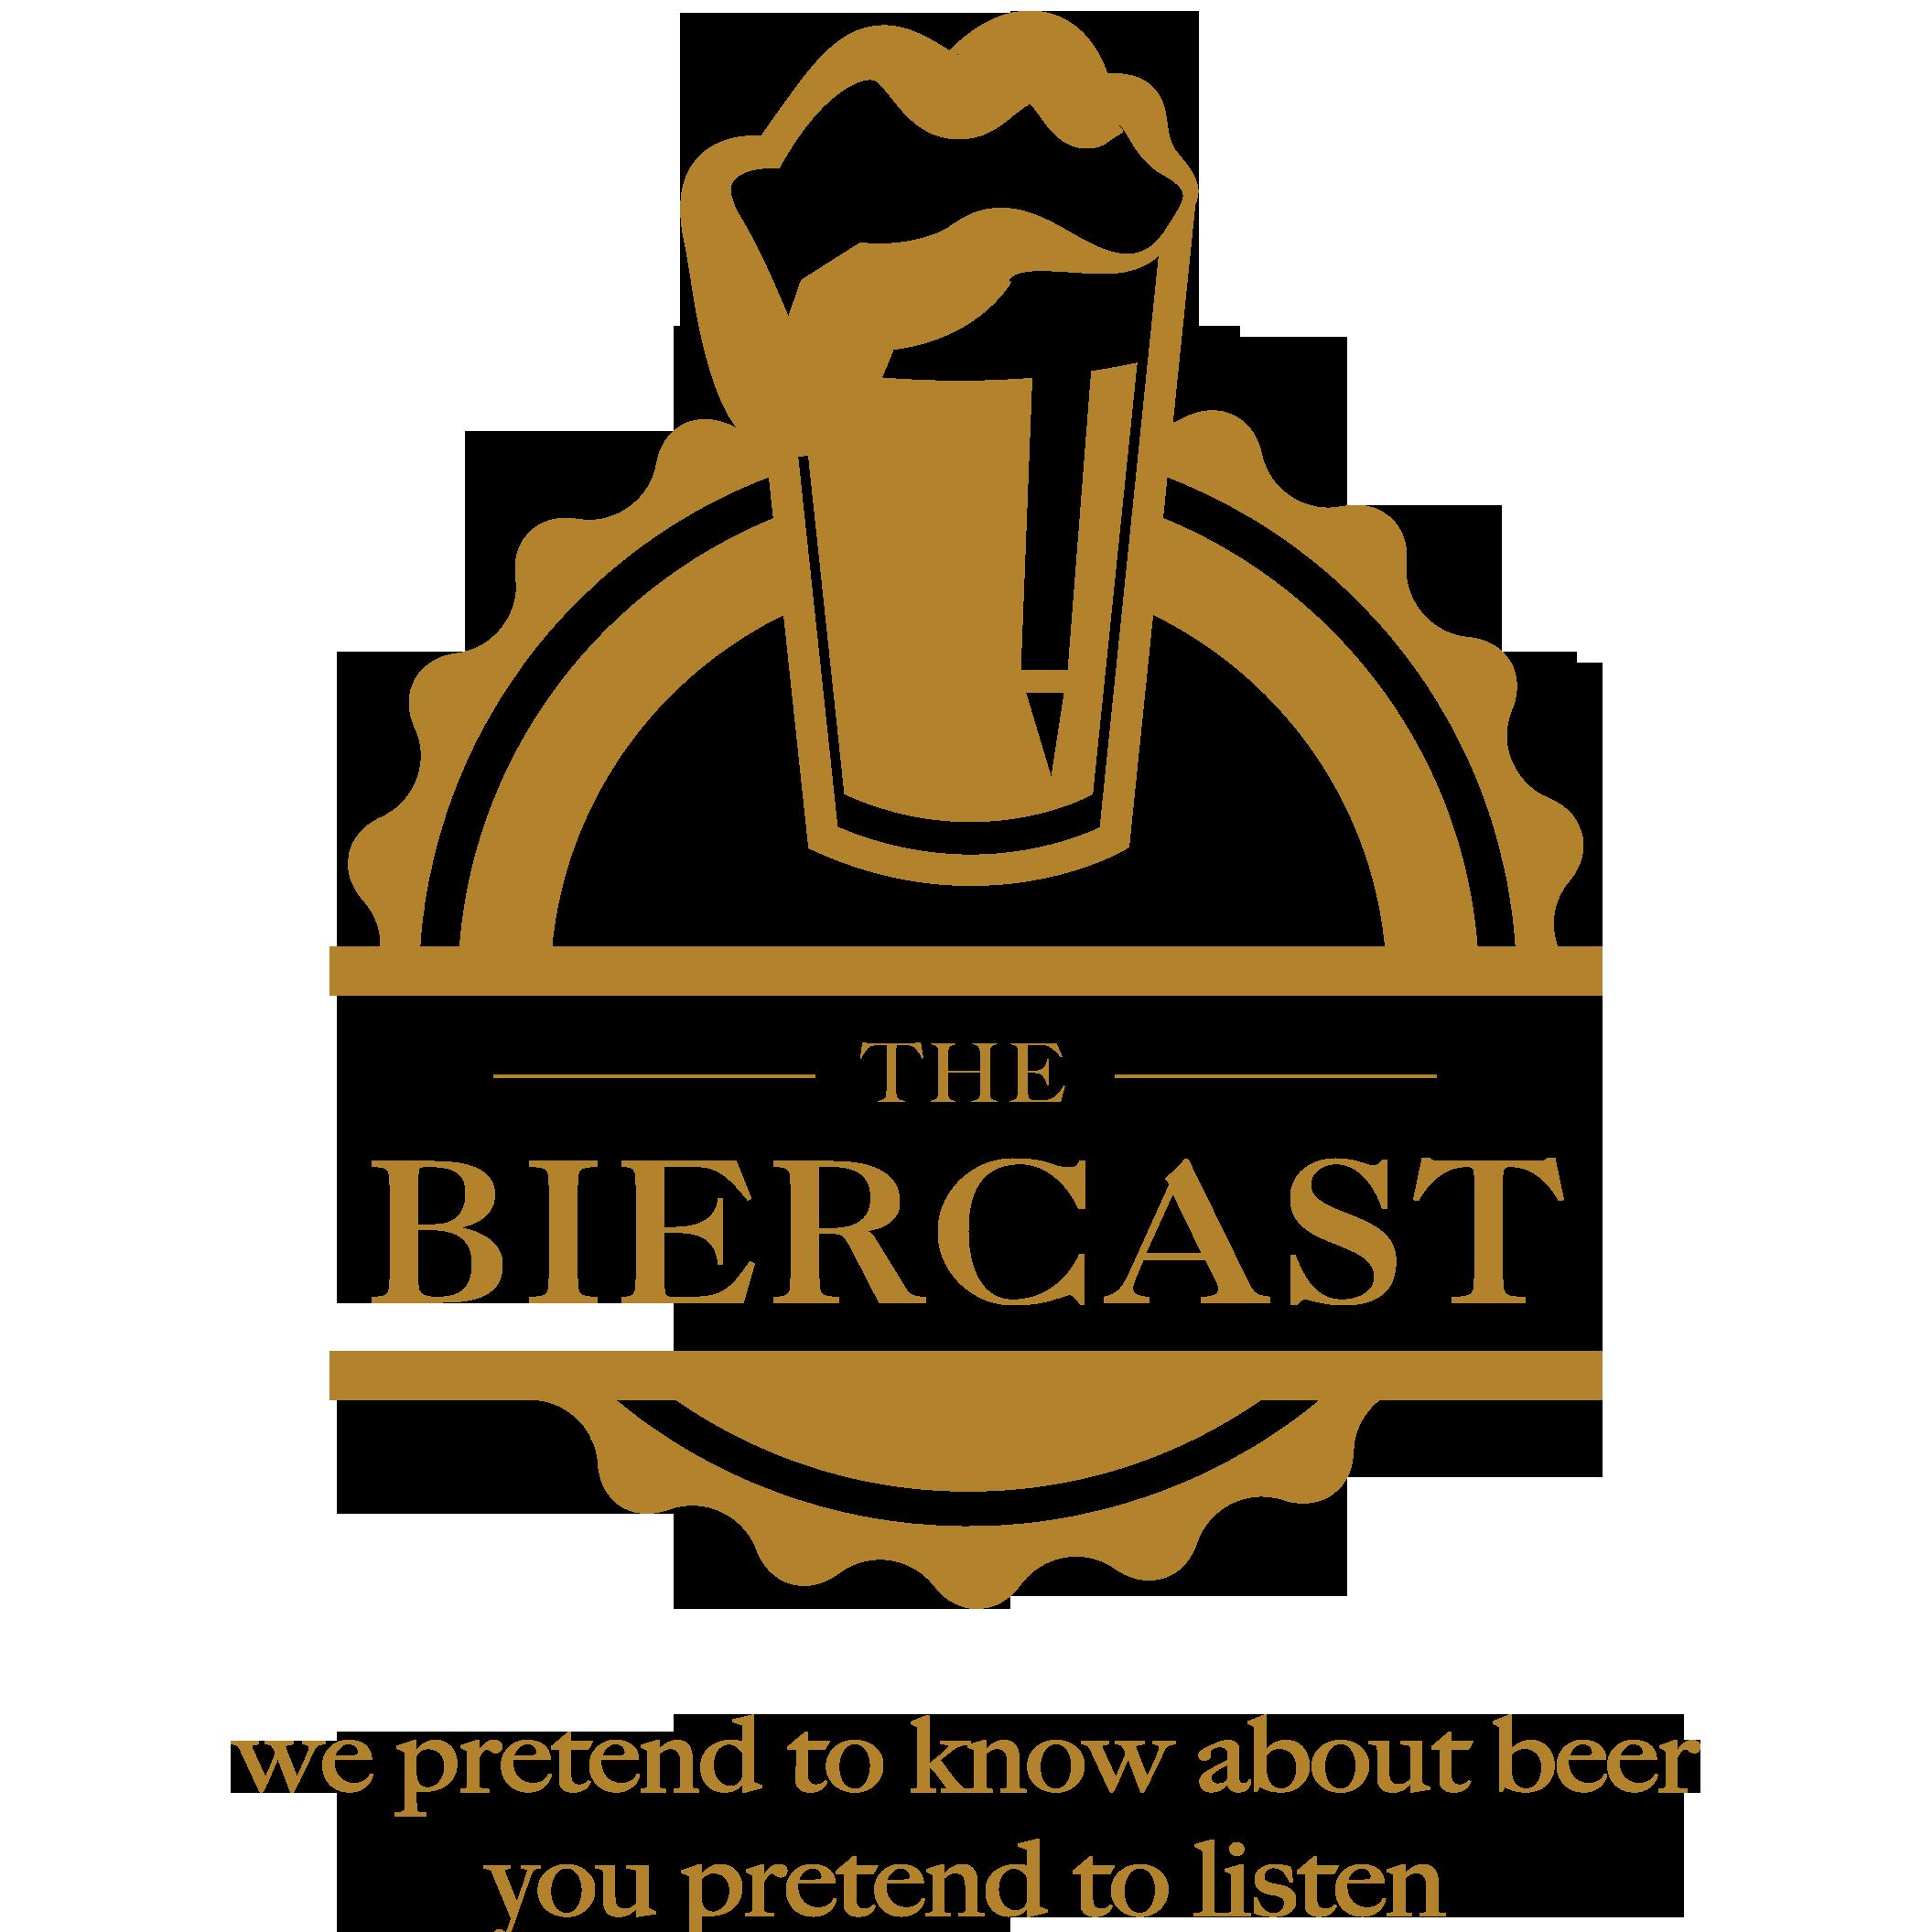 The Biercast